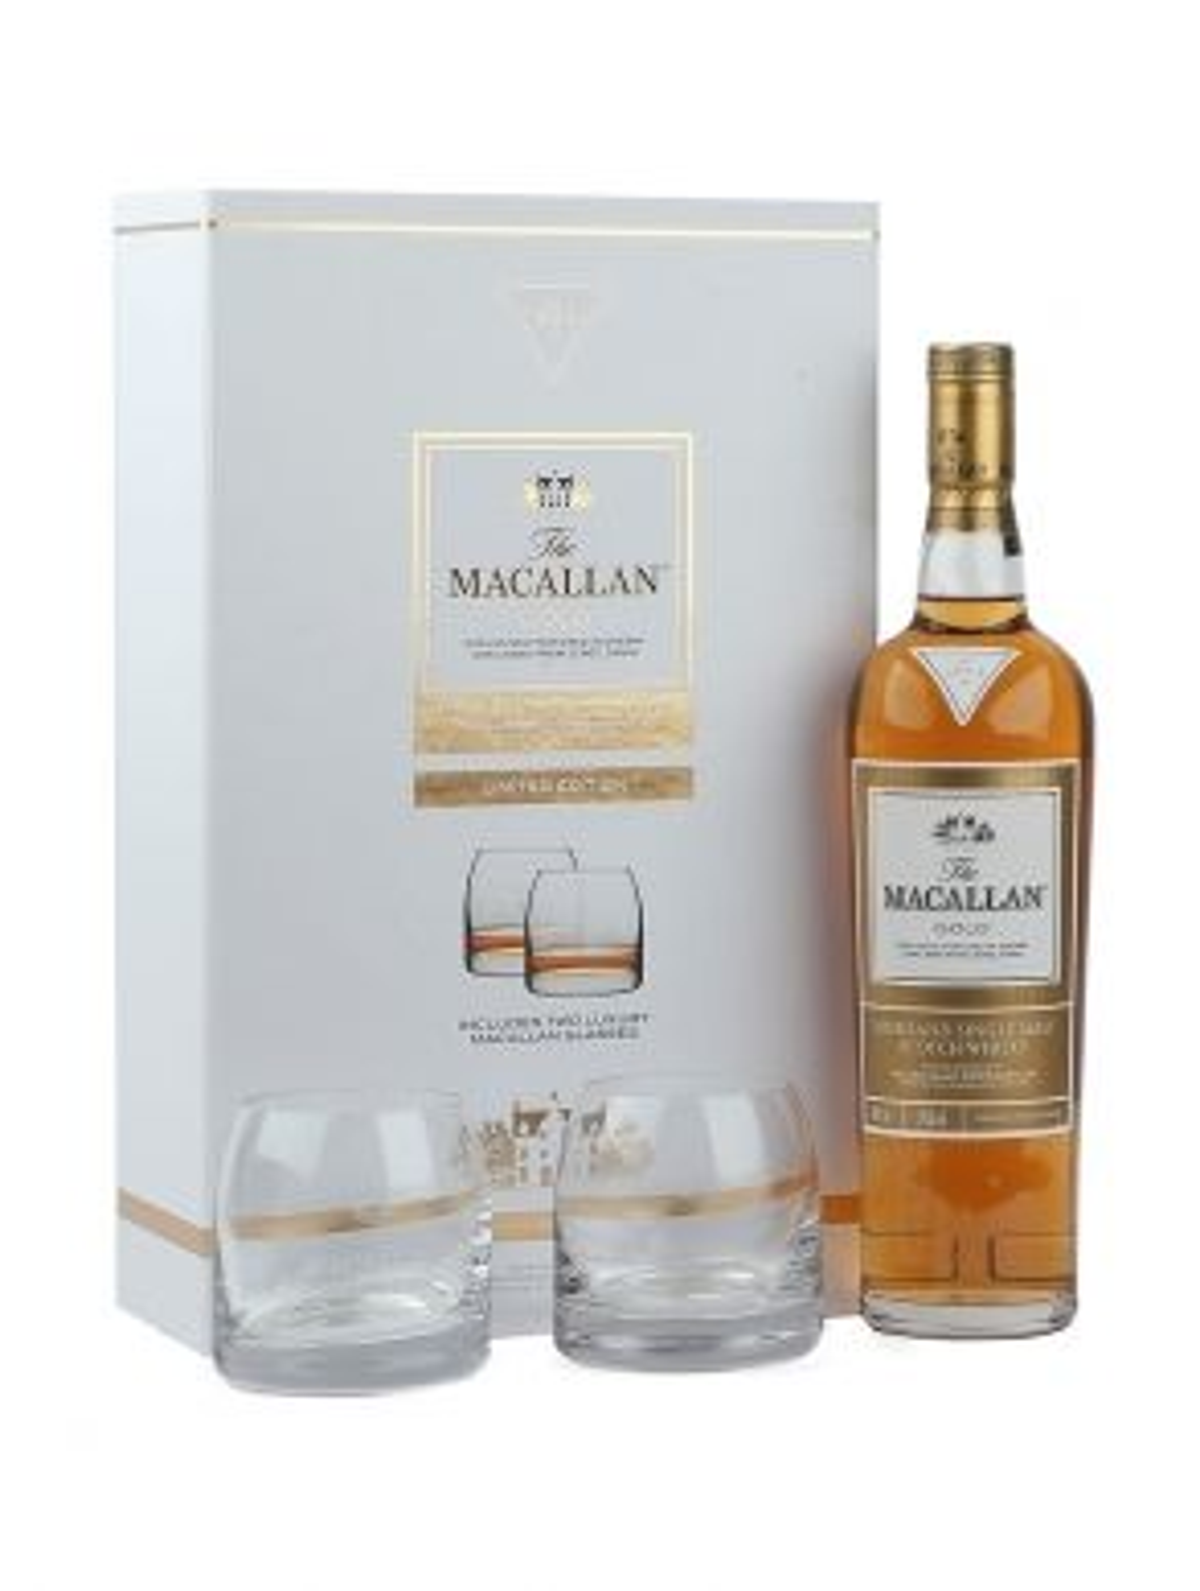 Macallan 1824 Series Gold Whisky 70cl Tumbler Gift Set